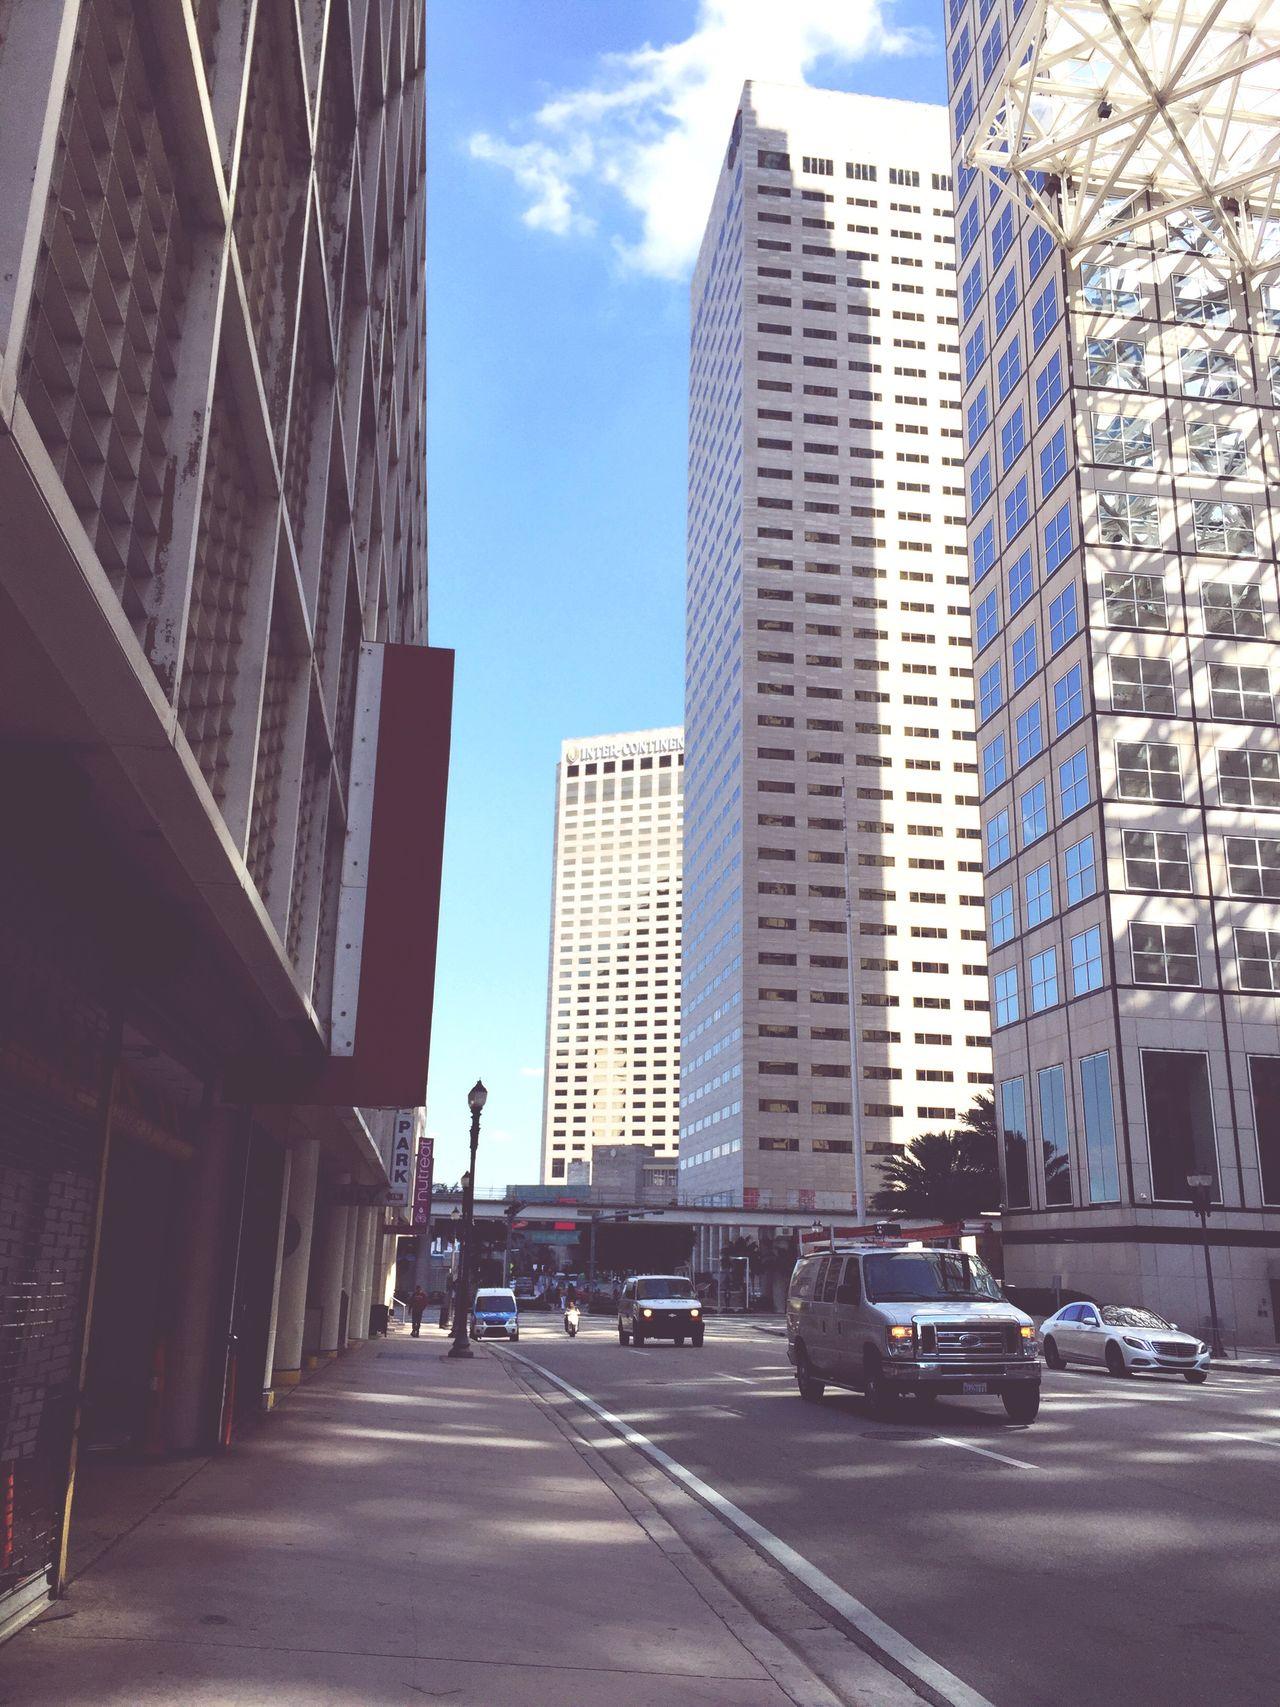 Beautiful stock photos of miami, Architecture, Building, Building Exterior, Built Structure